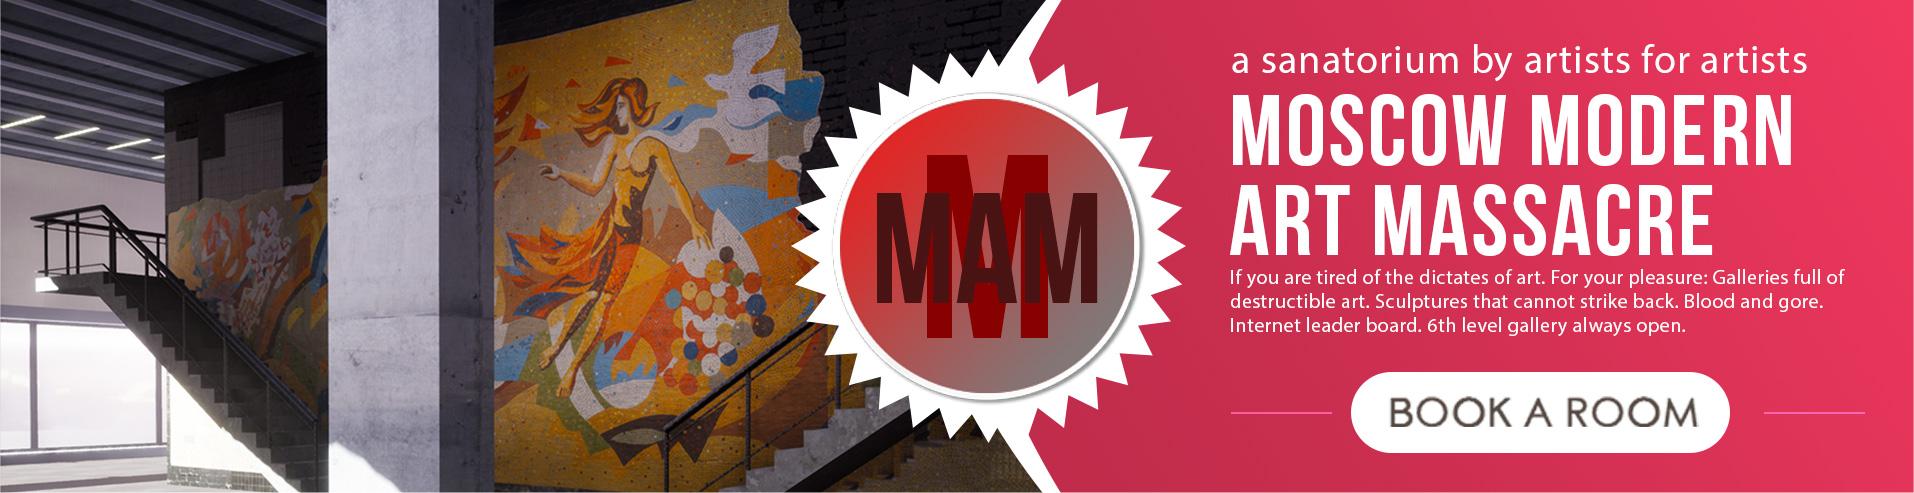 Moscow Modern Art Massacre - a shooter by artists for artists